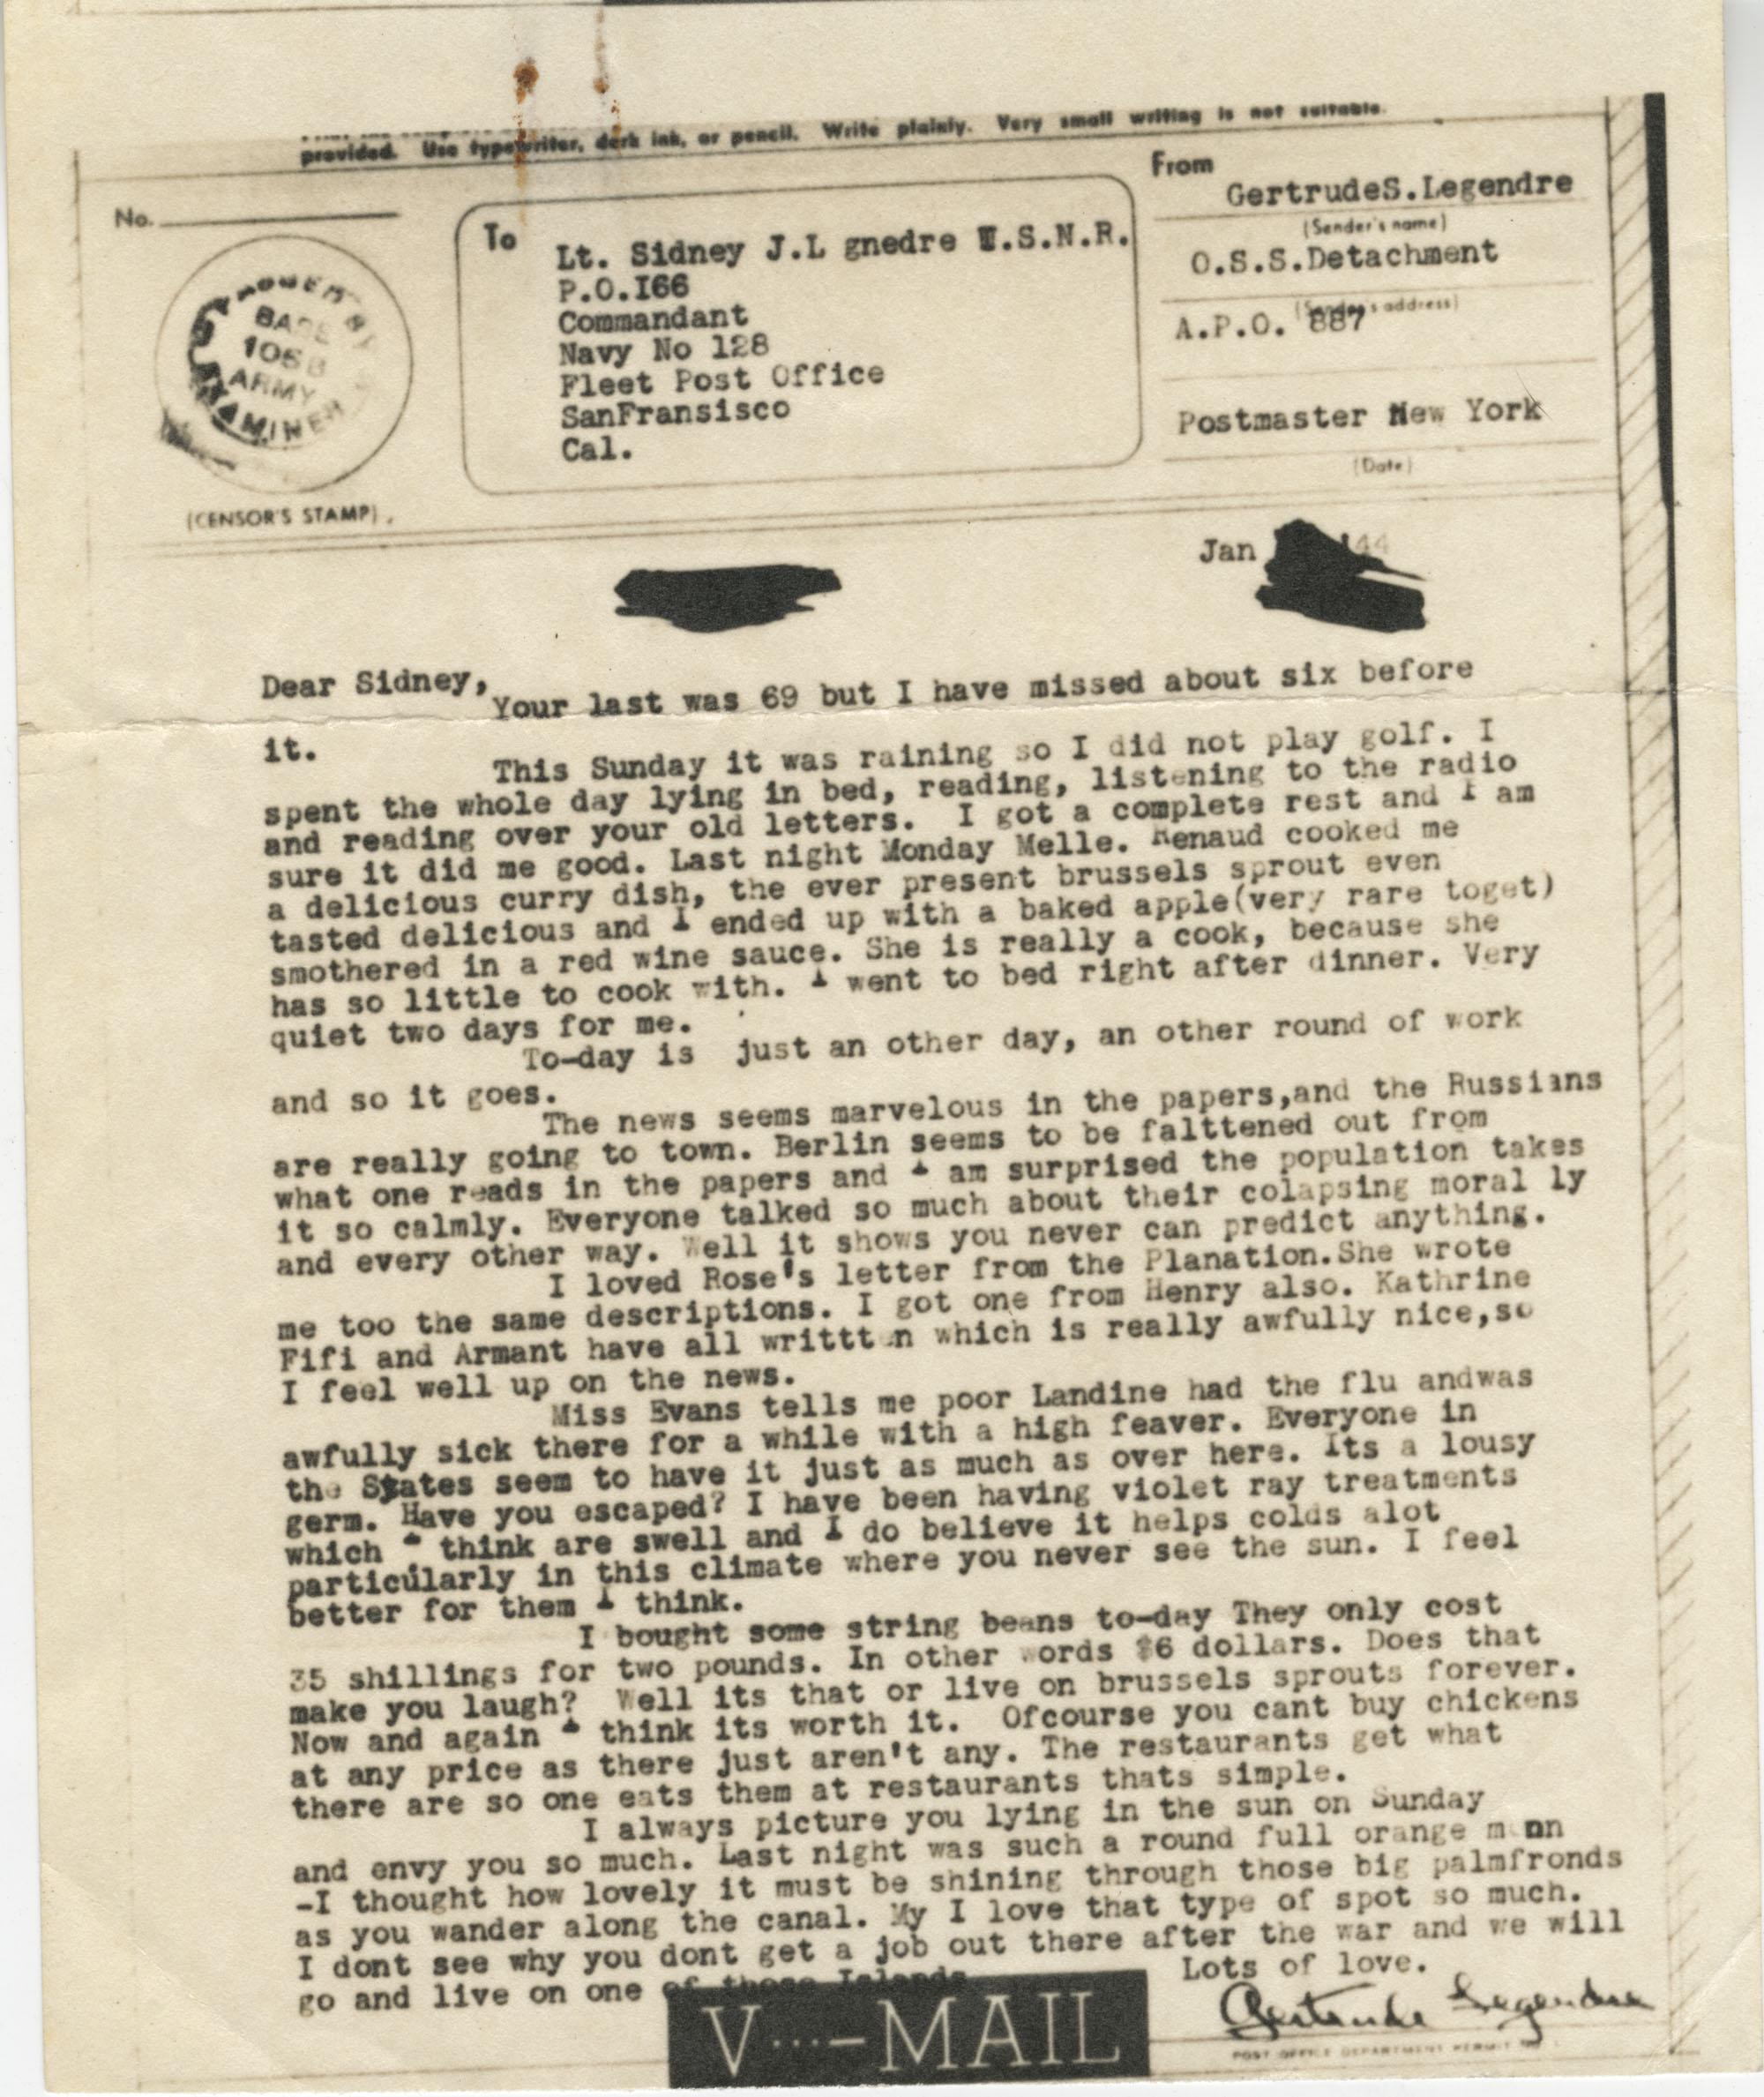 Letter from Gertrude Sanford Legendre, January 1944